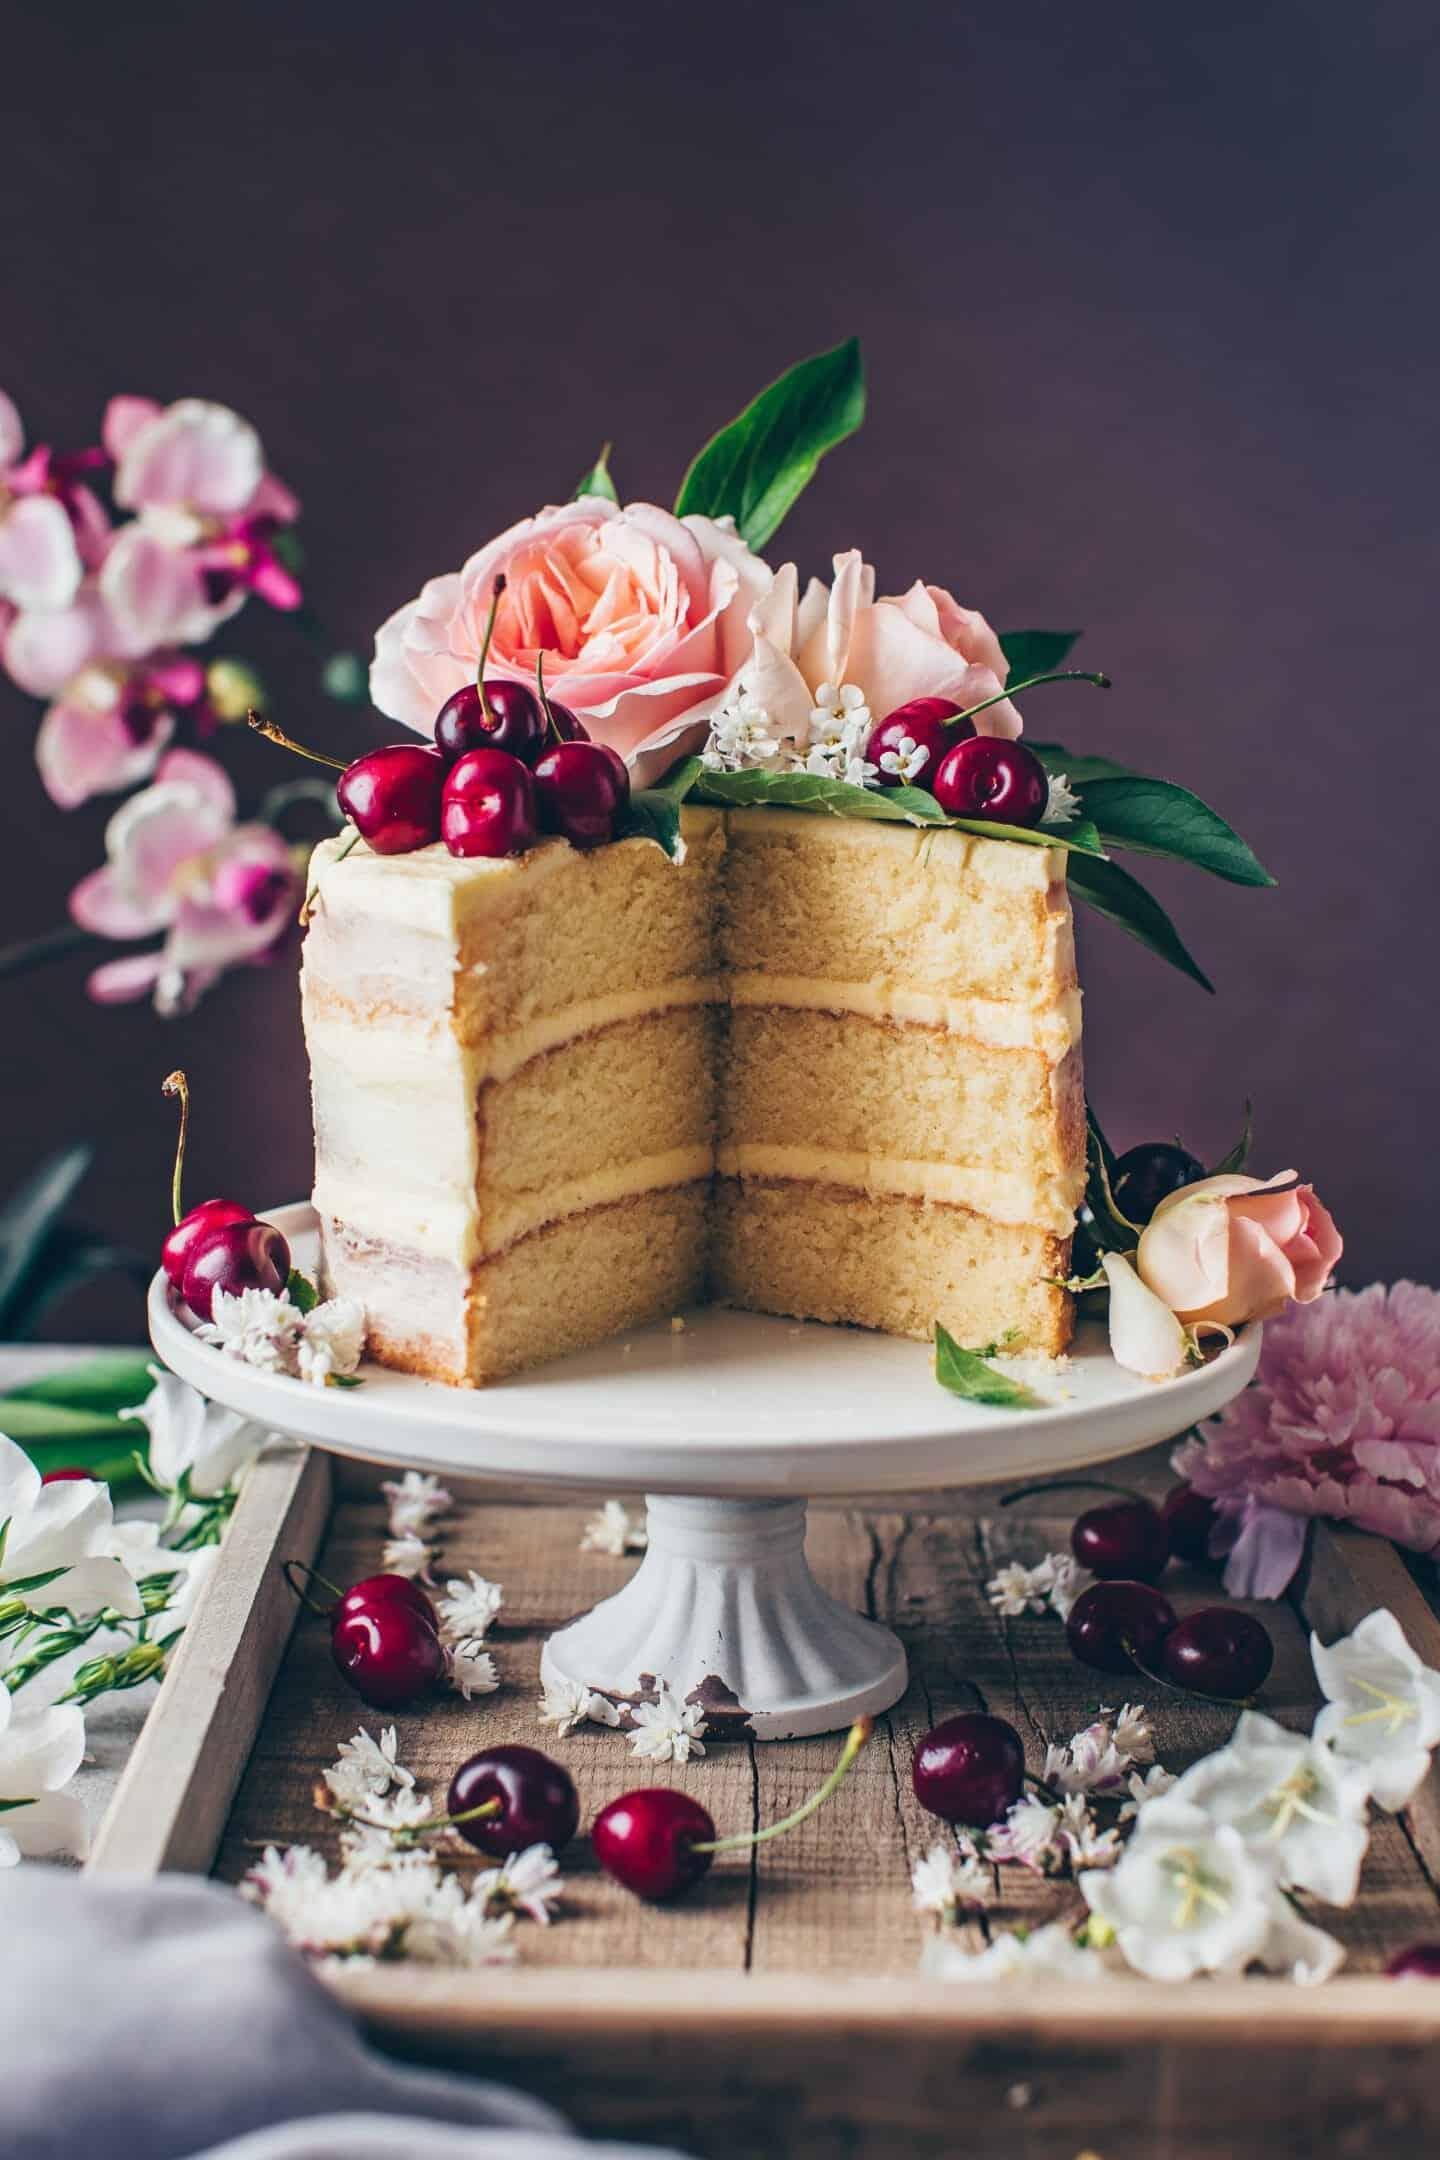 Vegan Vanilla Cake recipe. Soft and moist vanilla layer cake with vegan buttercream frosting. Easy Naked Cake.